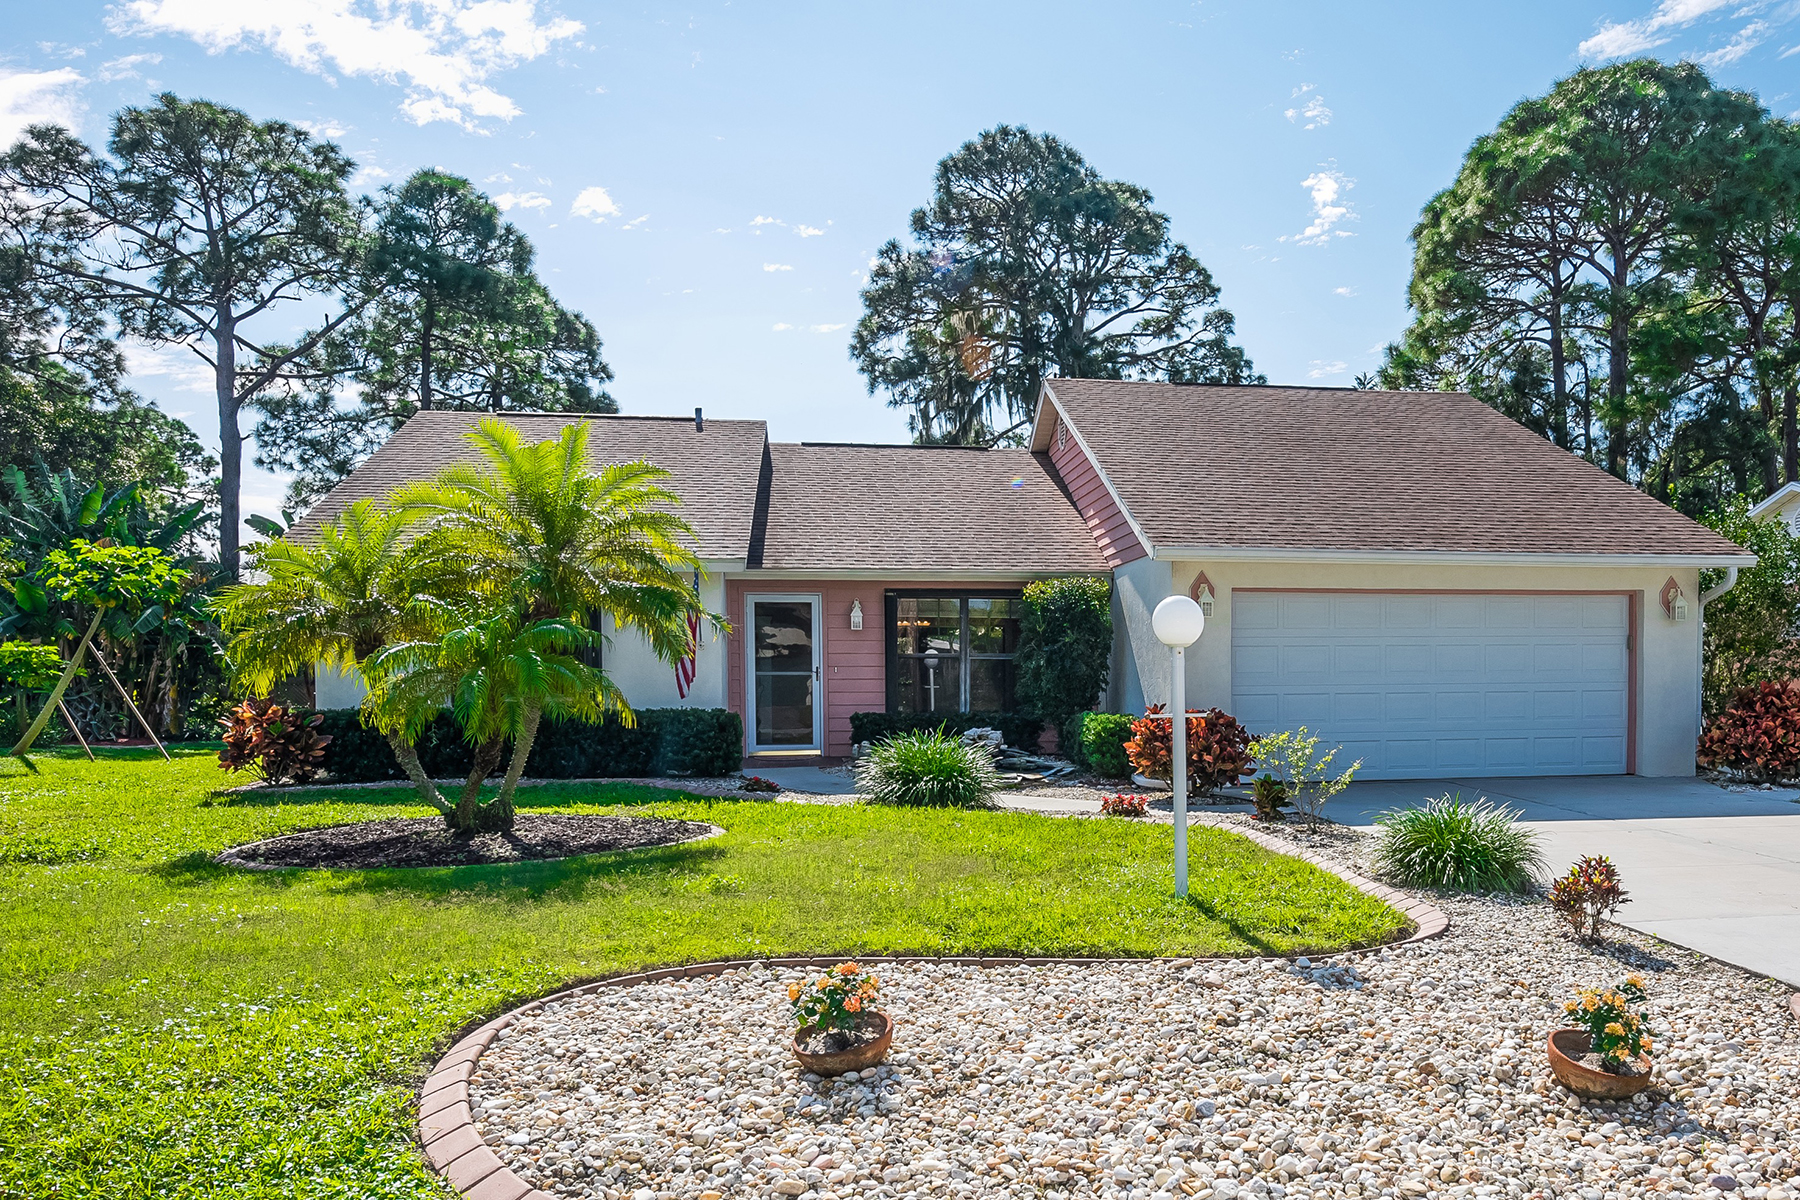 Single Family Home for Sale at LAUREL PINES 124 Shady Pine Ln Nokomis, Florida 34275 United States